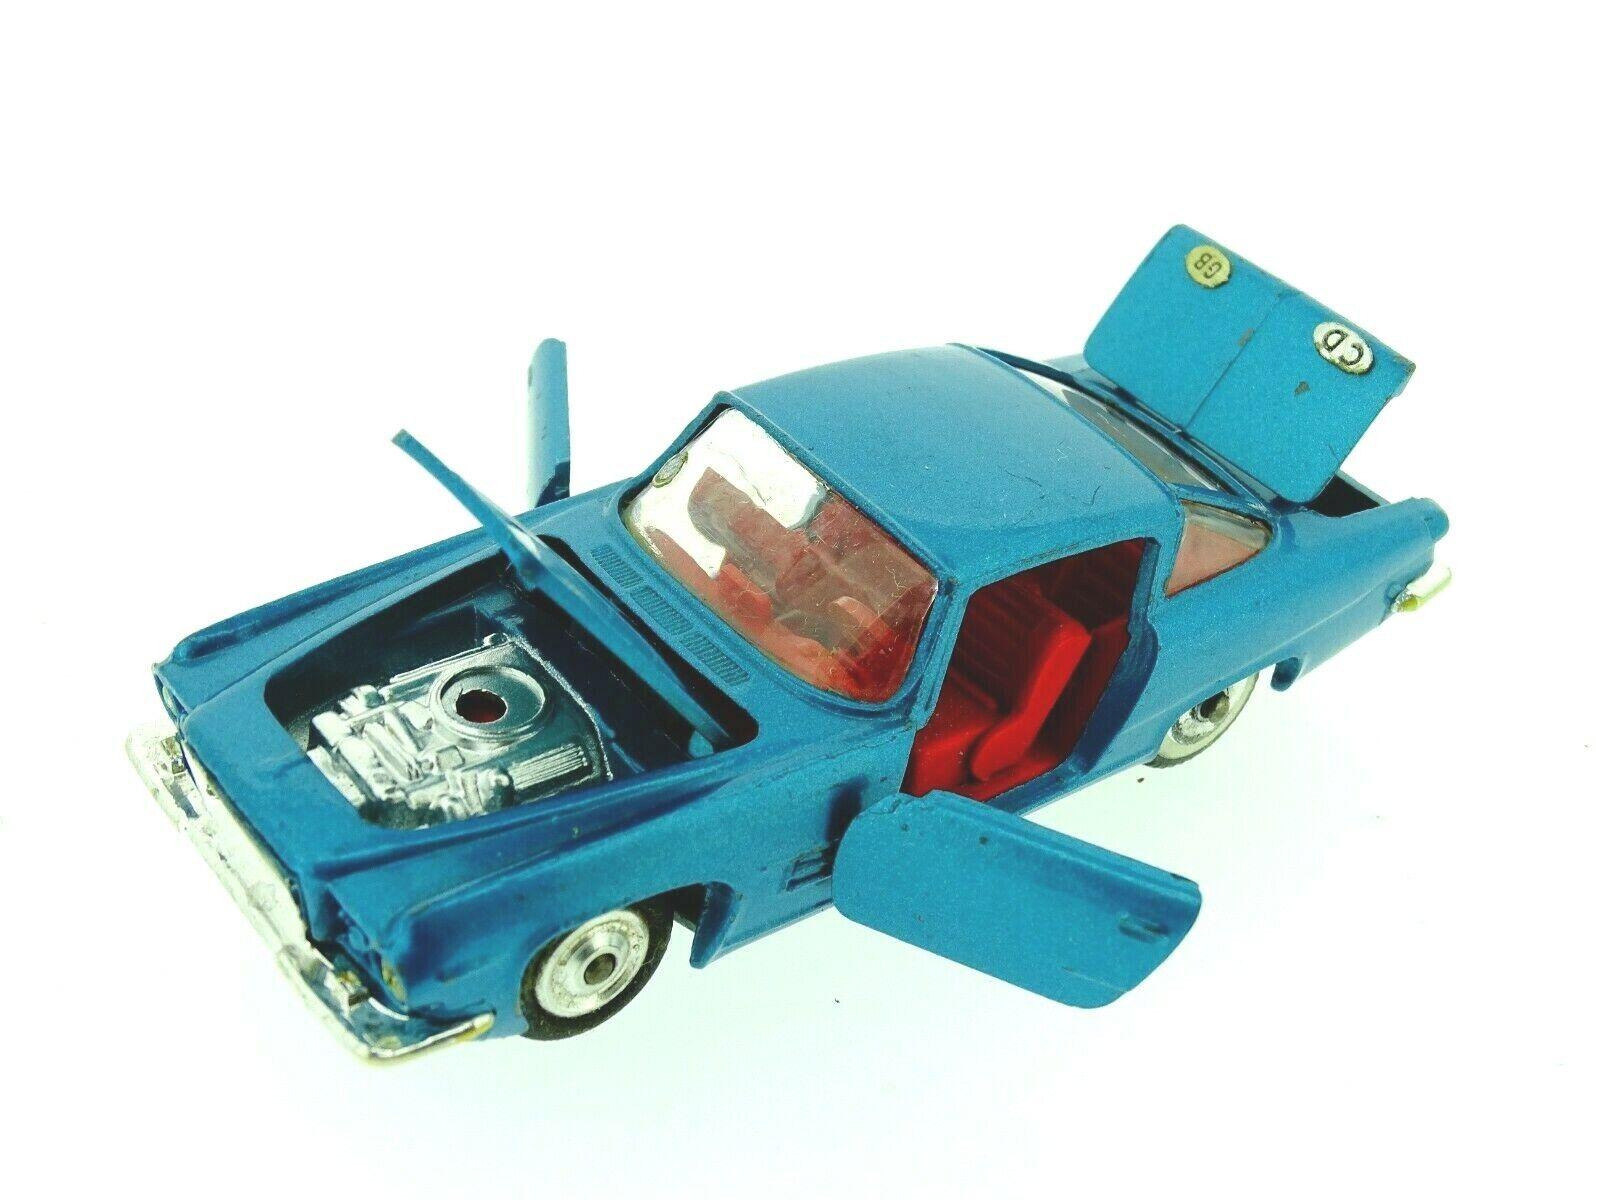 Vintage Corgi 241 Ghia L6.4 Chrysler Engine Blau In Original box VGC